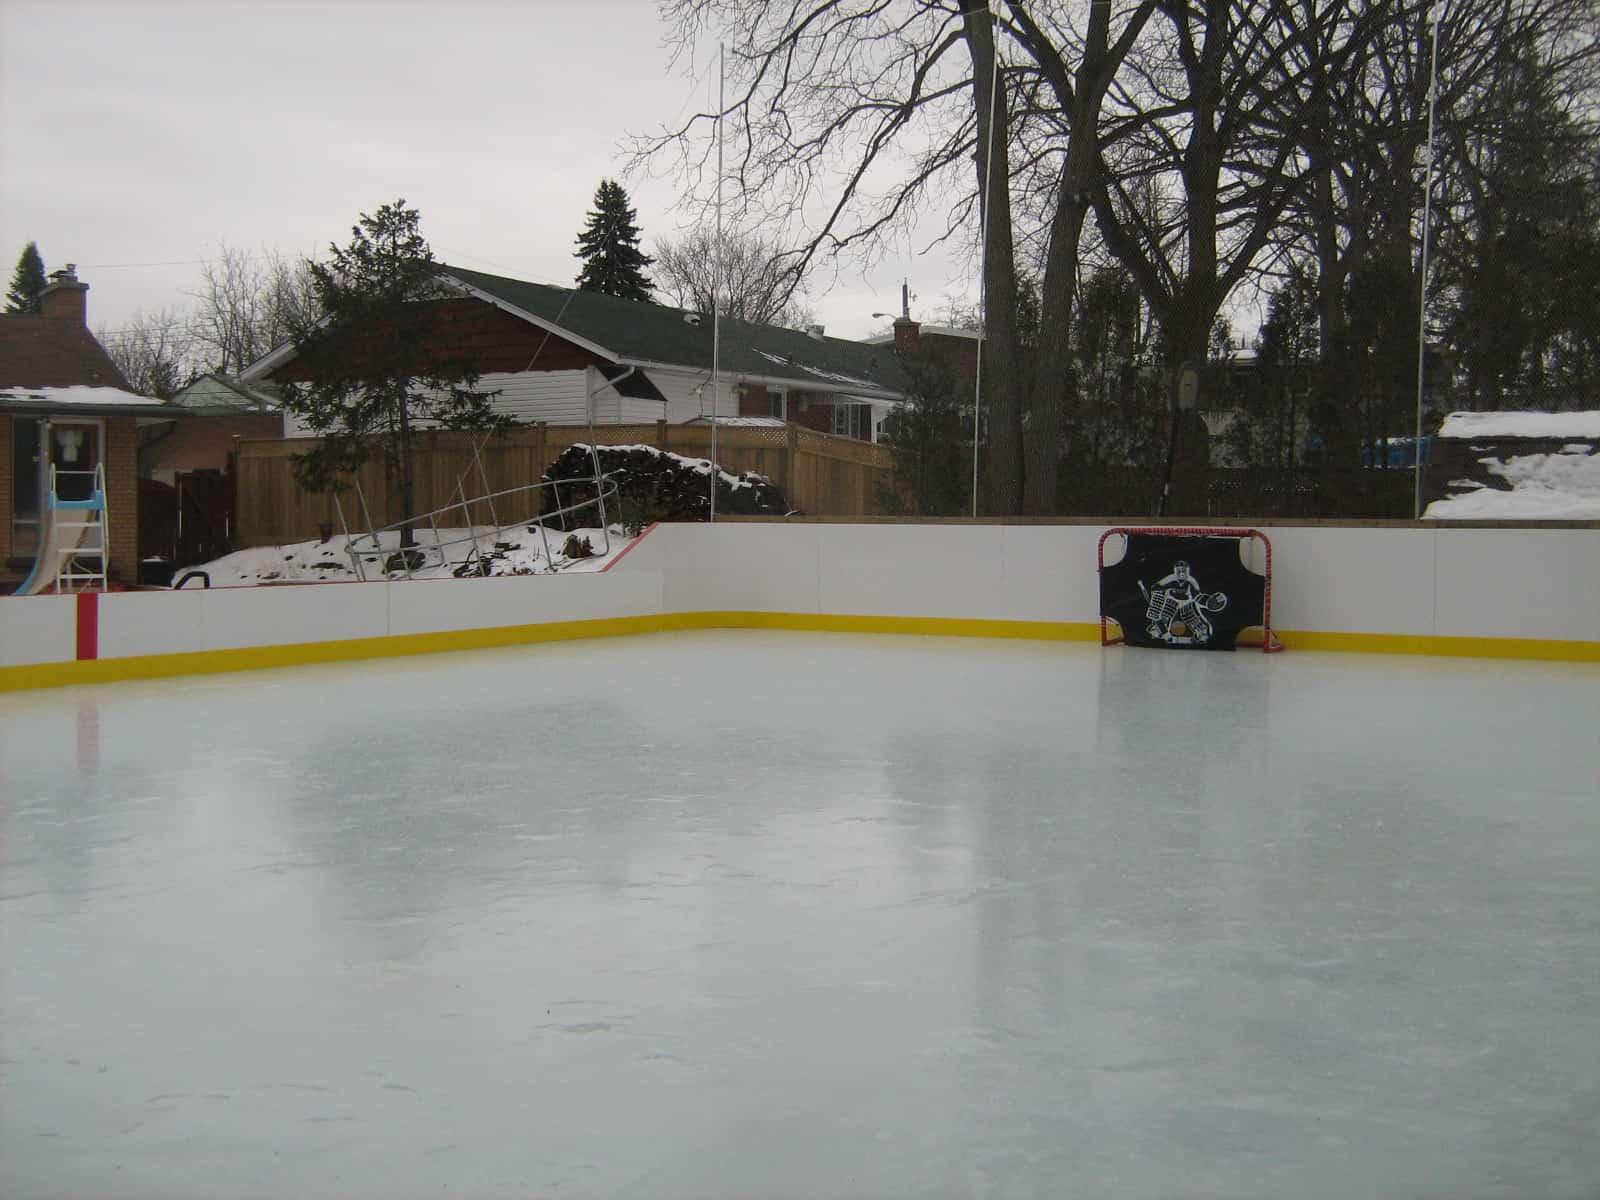 backyard rink liner high quality design